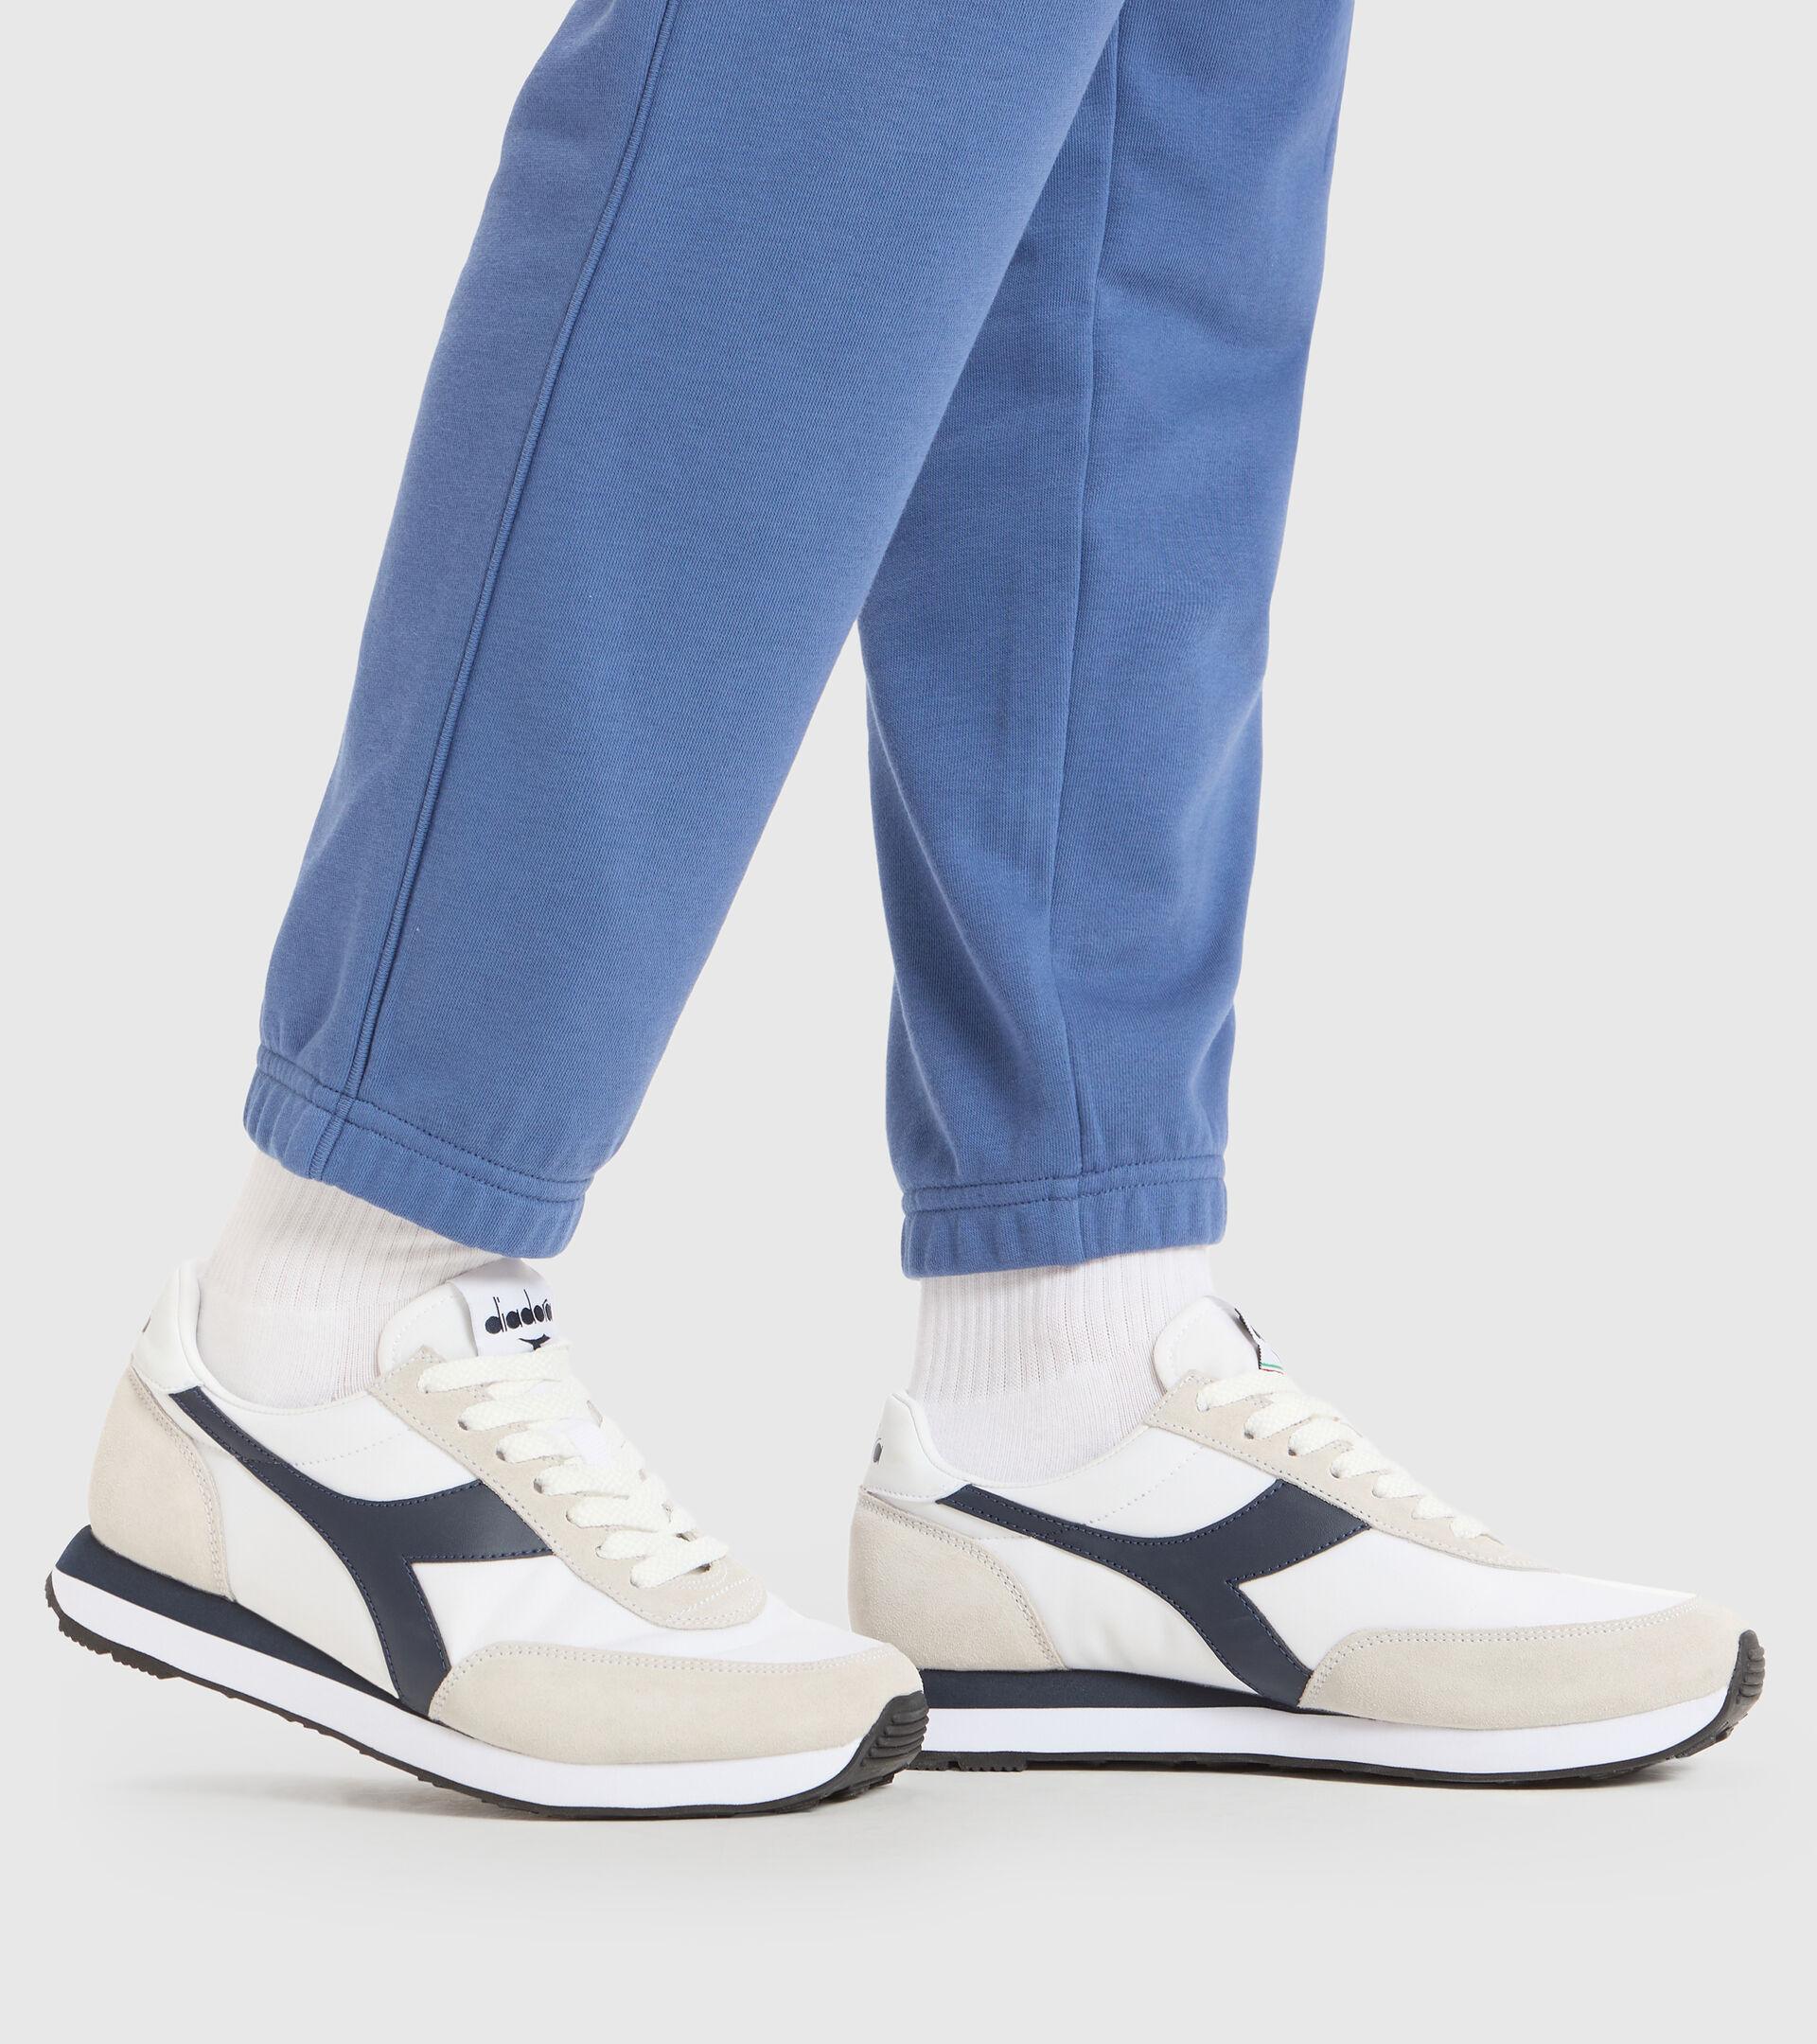 Footwear Sportswear UNISEX KOALA BIANCO/BLU PROFONDO Diadora